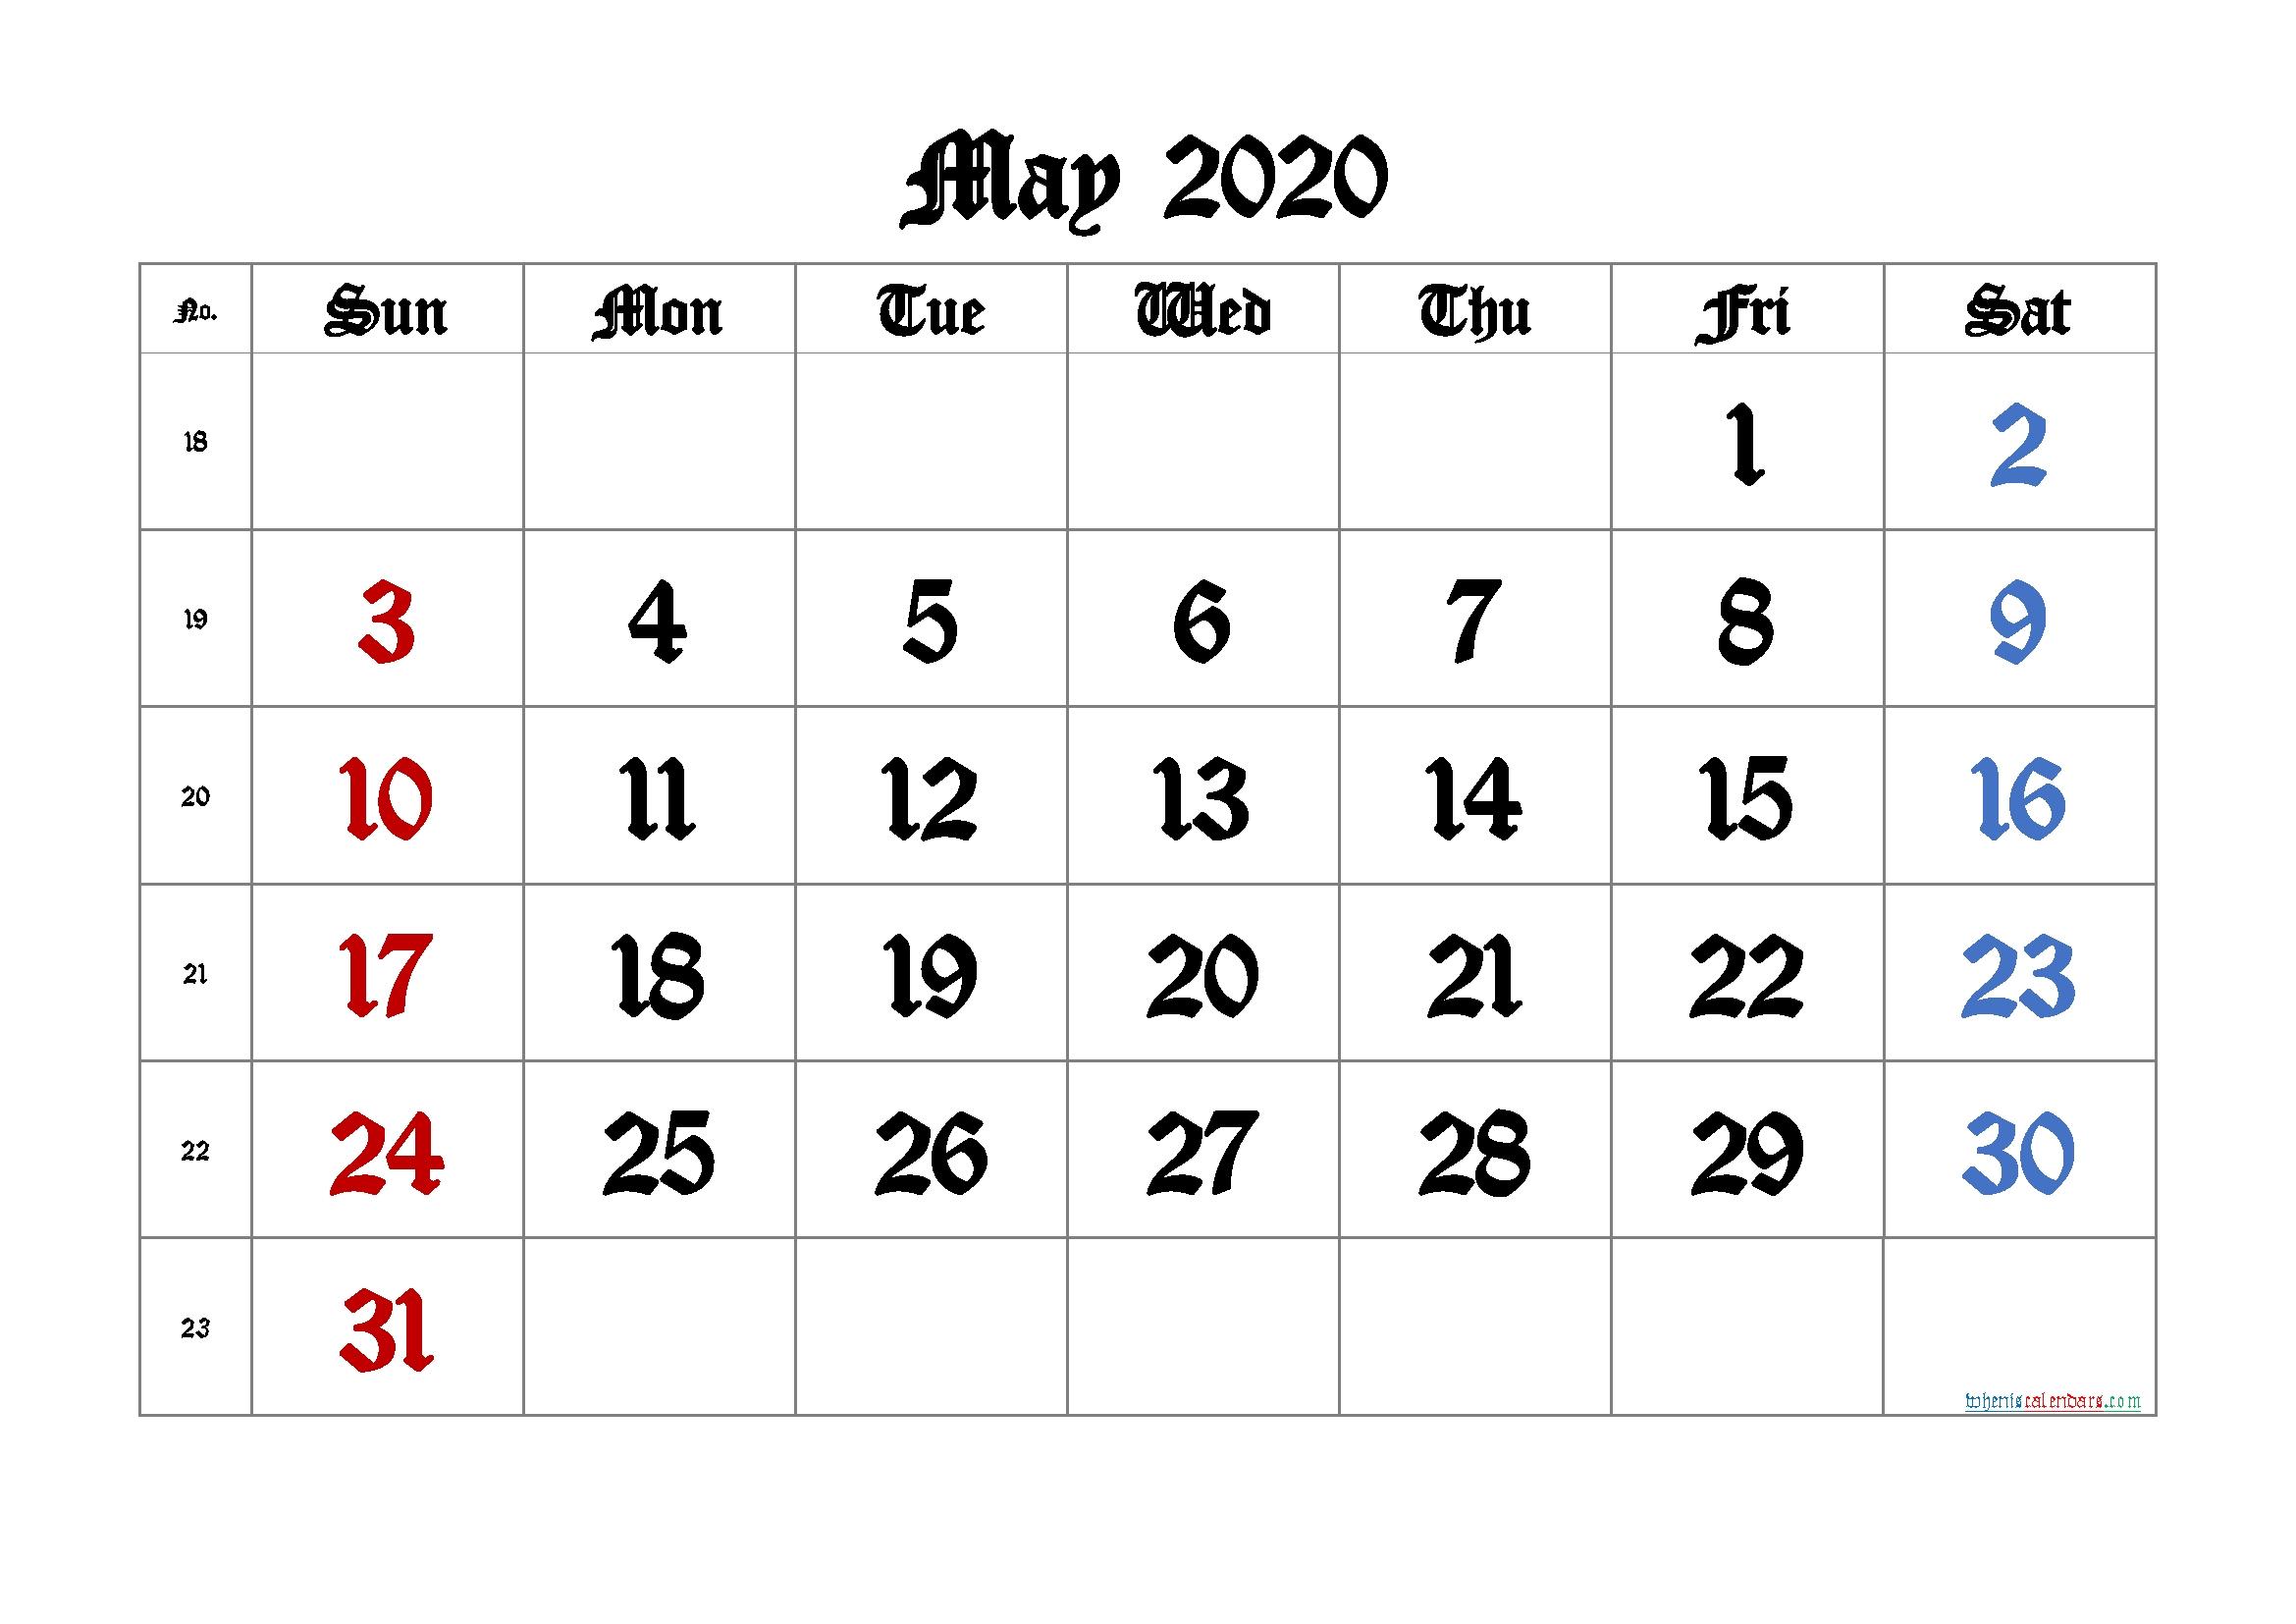 May 2020 Printable Calendar With Week Numbers – 6 Templates